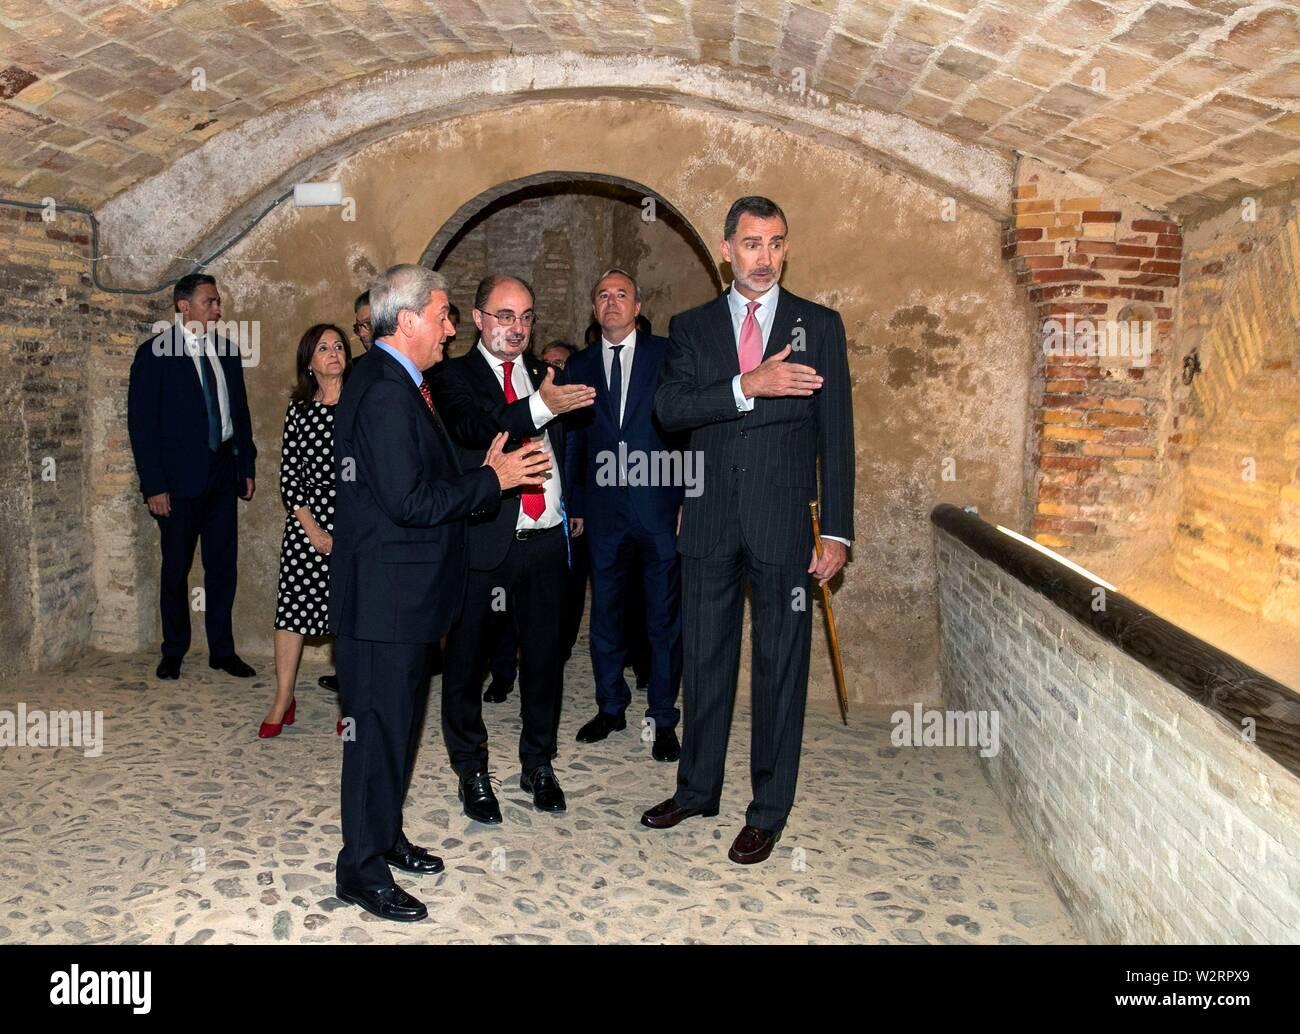 Spanish King Felipe VI (R) visits the Real Maestranza de Caballeria of Zaragoza Palace in Zaragoza, Spain, 10 July 2019, on occasion of the 200th anniversary of his creation. EFE/ Javier Cebollada/**POOL** - Stock Image